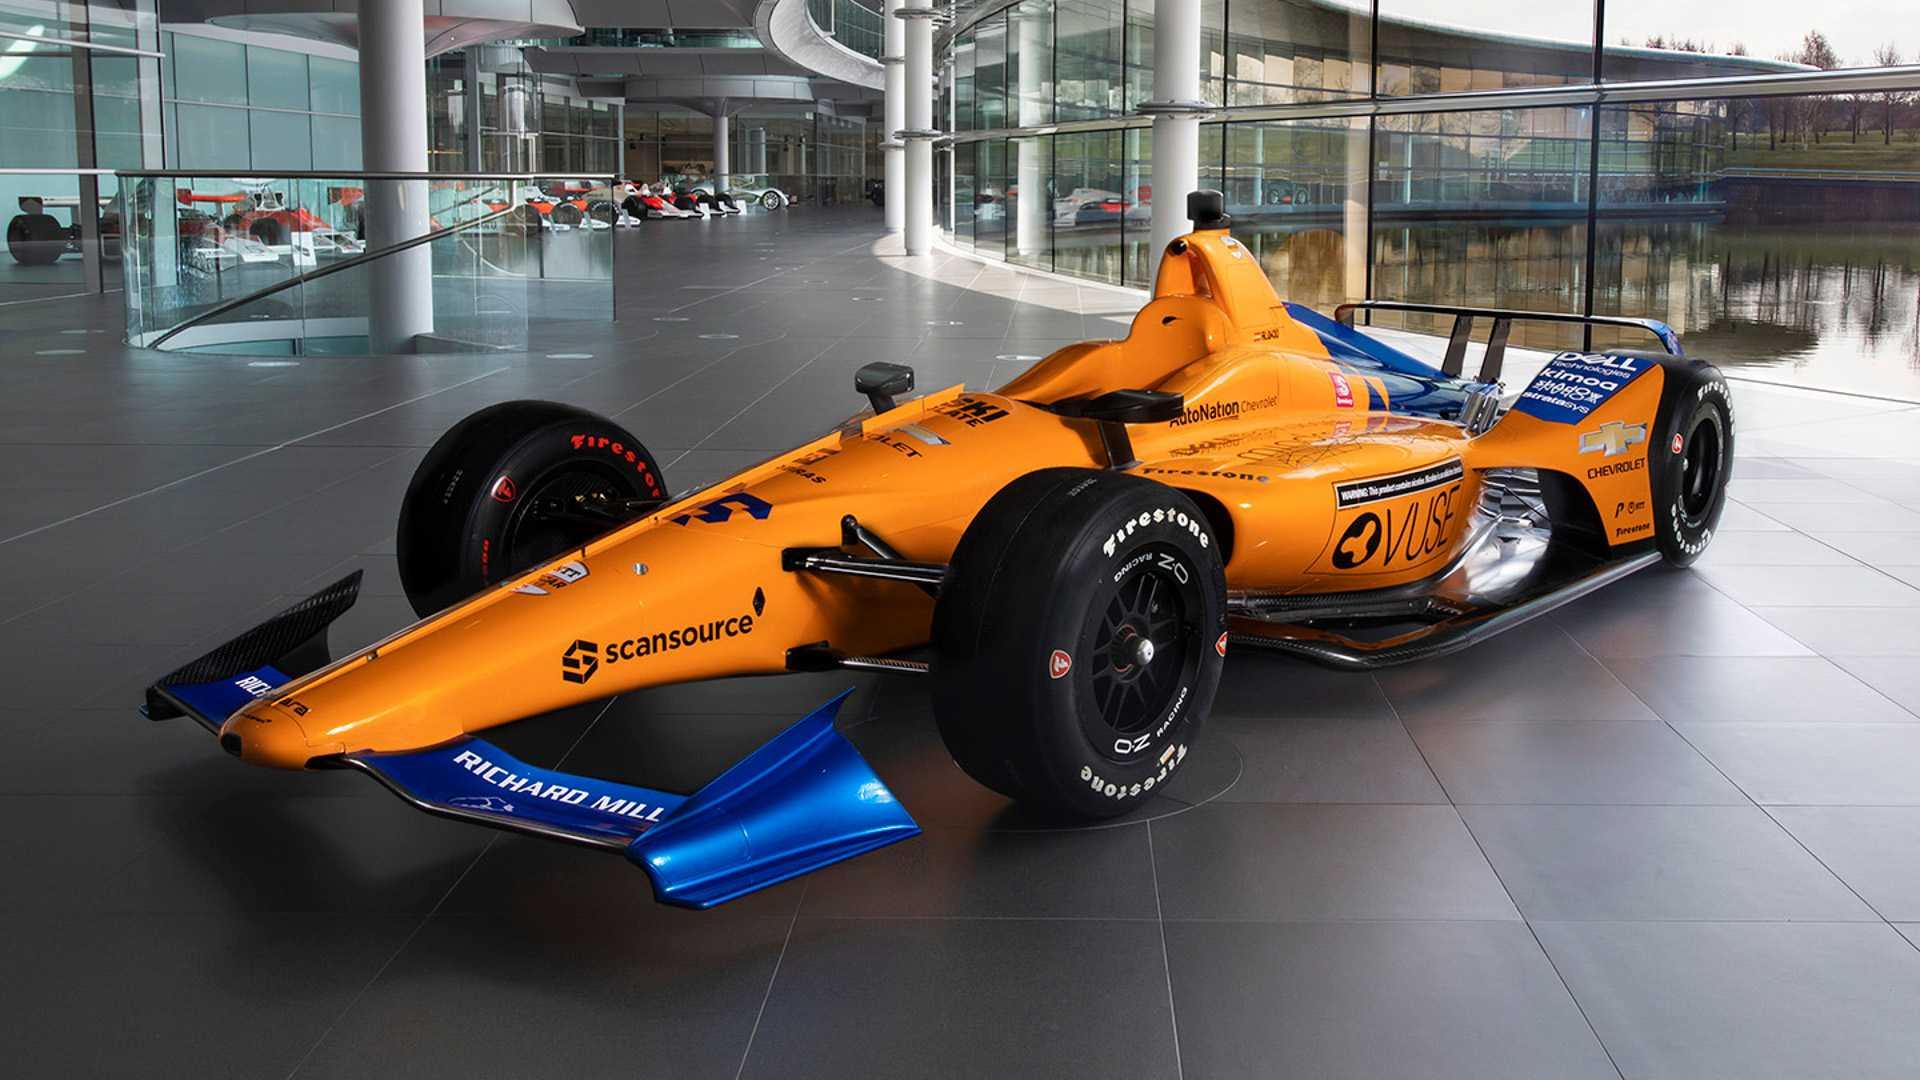 McLaren reveals Alonsos Indy 500 car 1920x1080